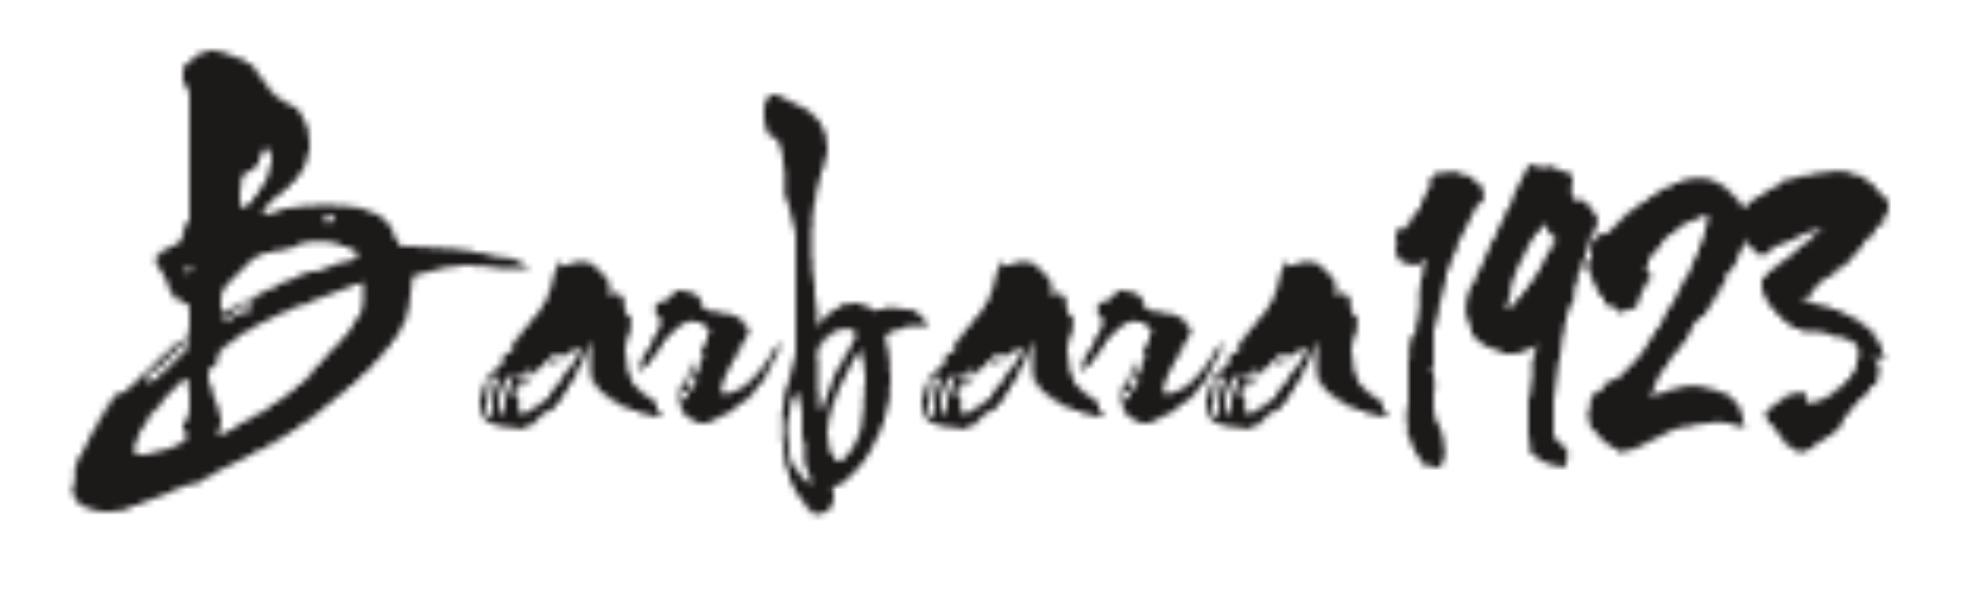 Barbara Onianwah Signature